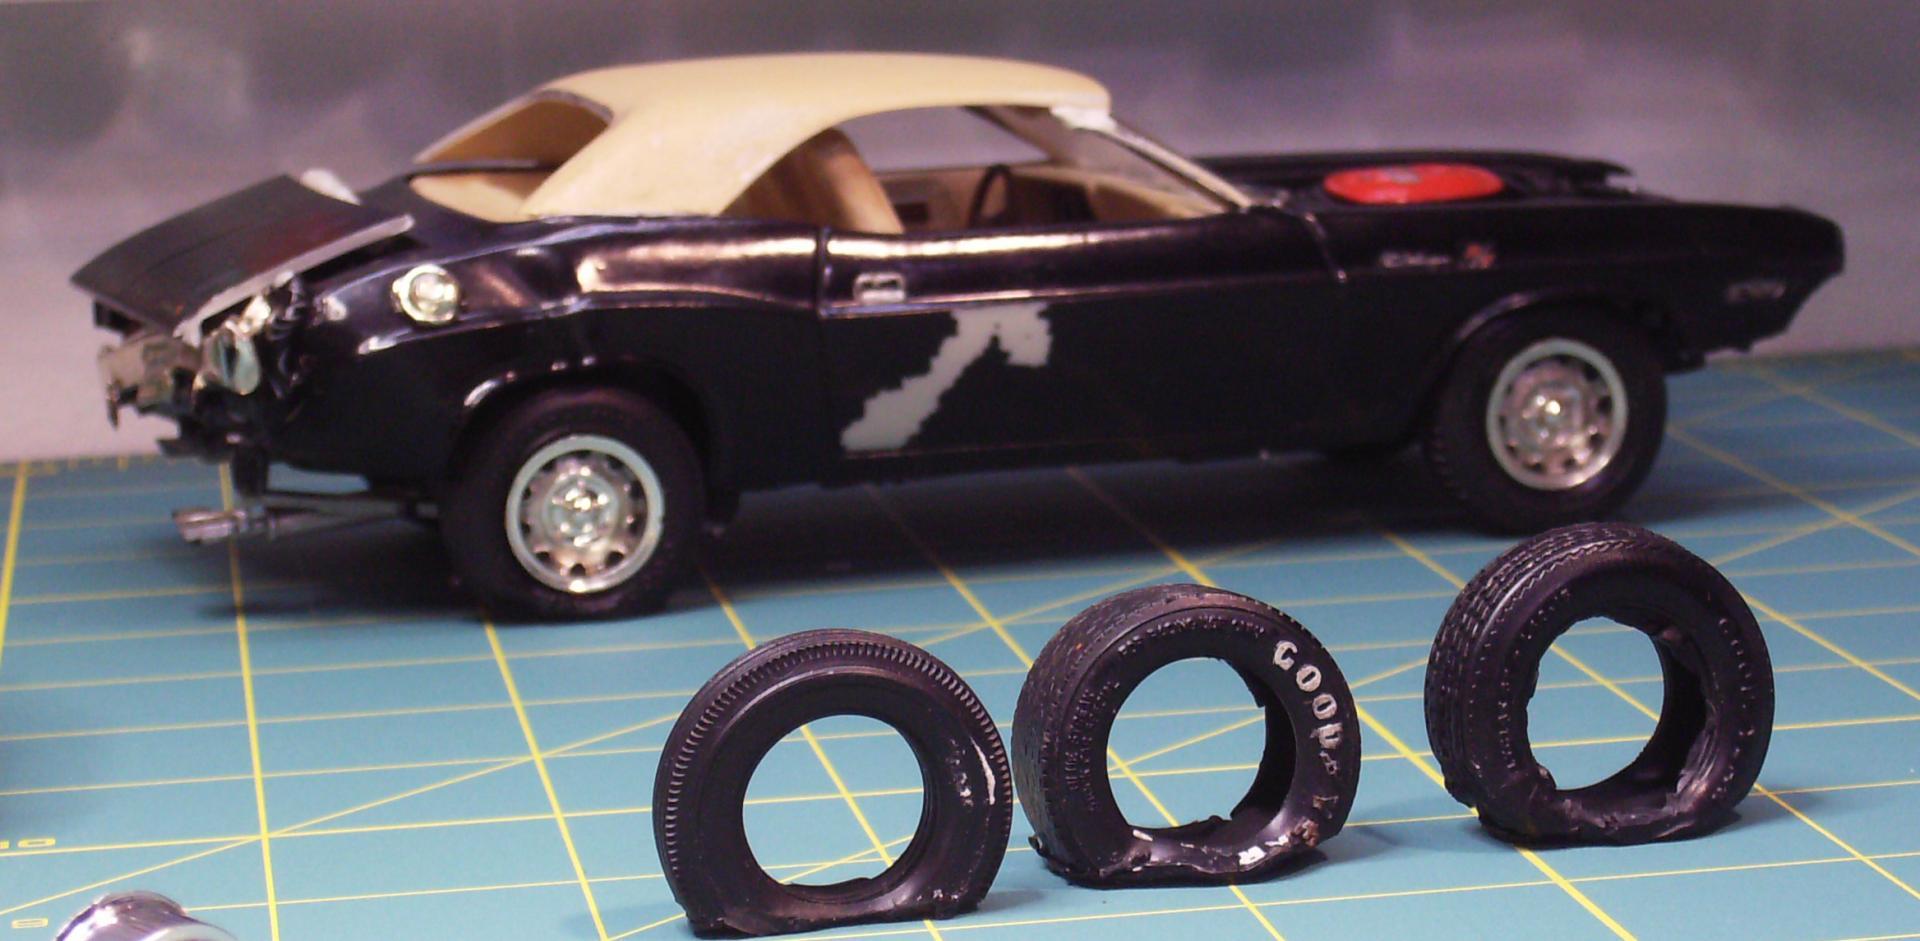 flat tires.jpg